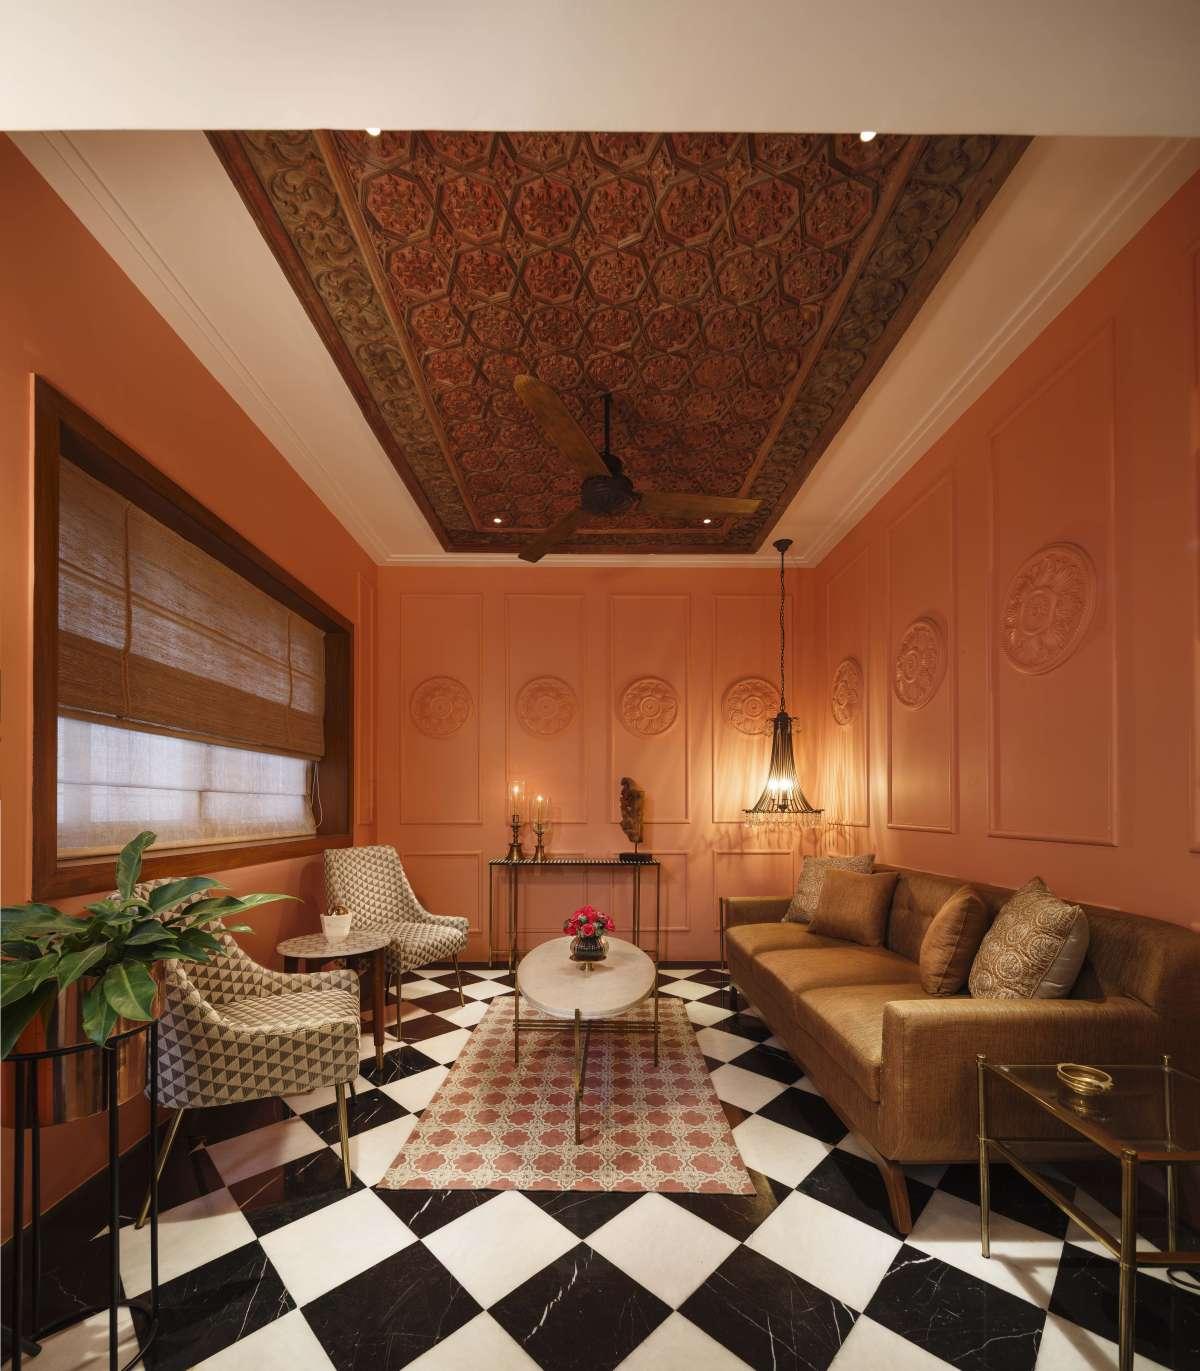 Interior designer Smitha Zachariah on India Modern and Co-creation